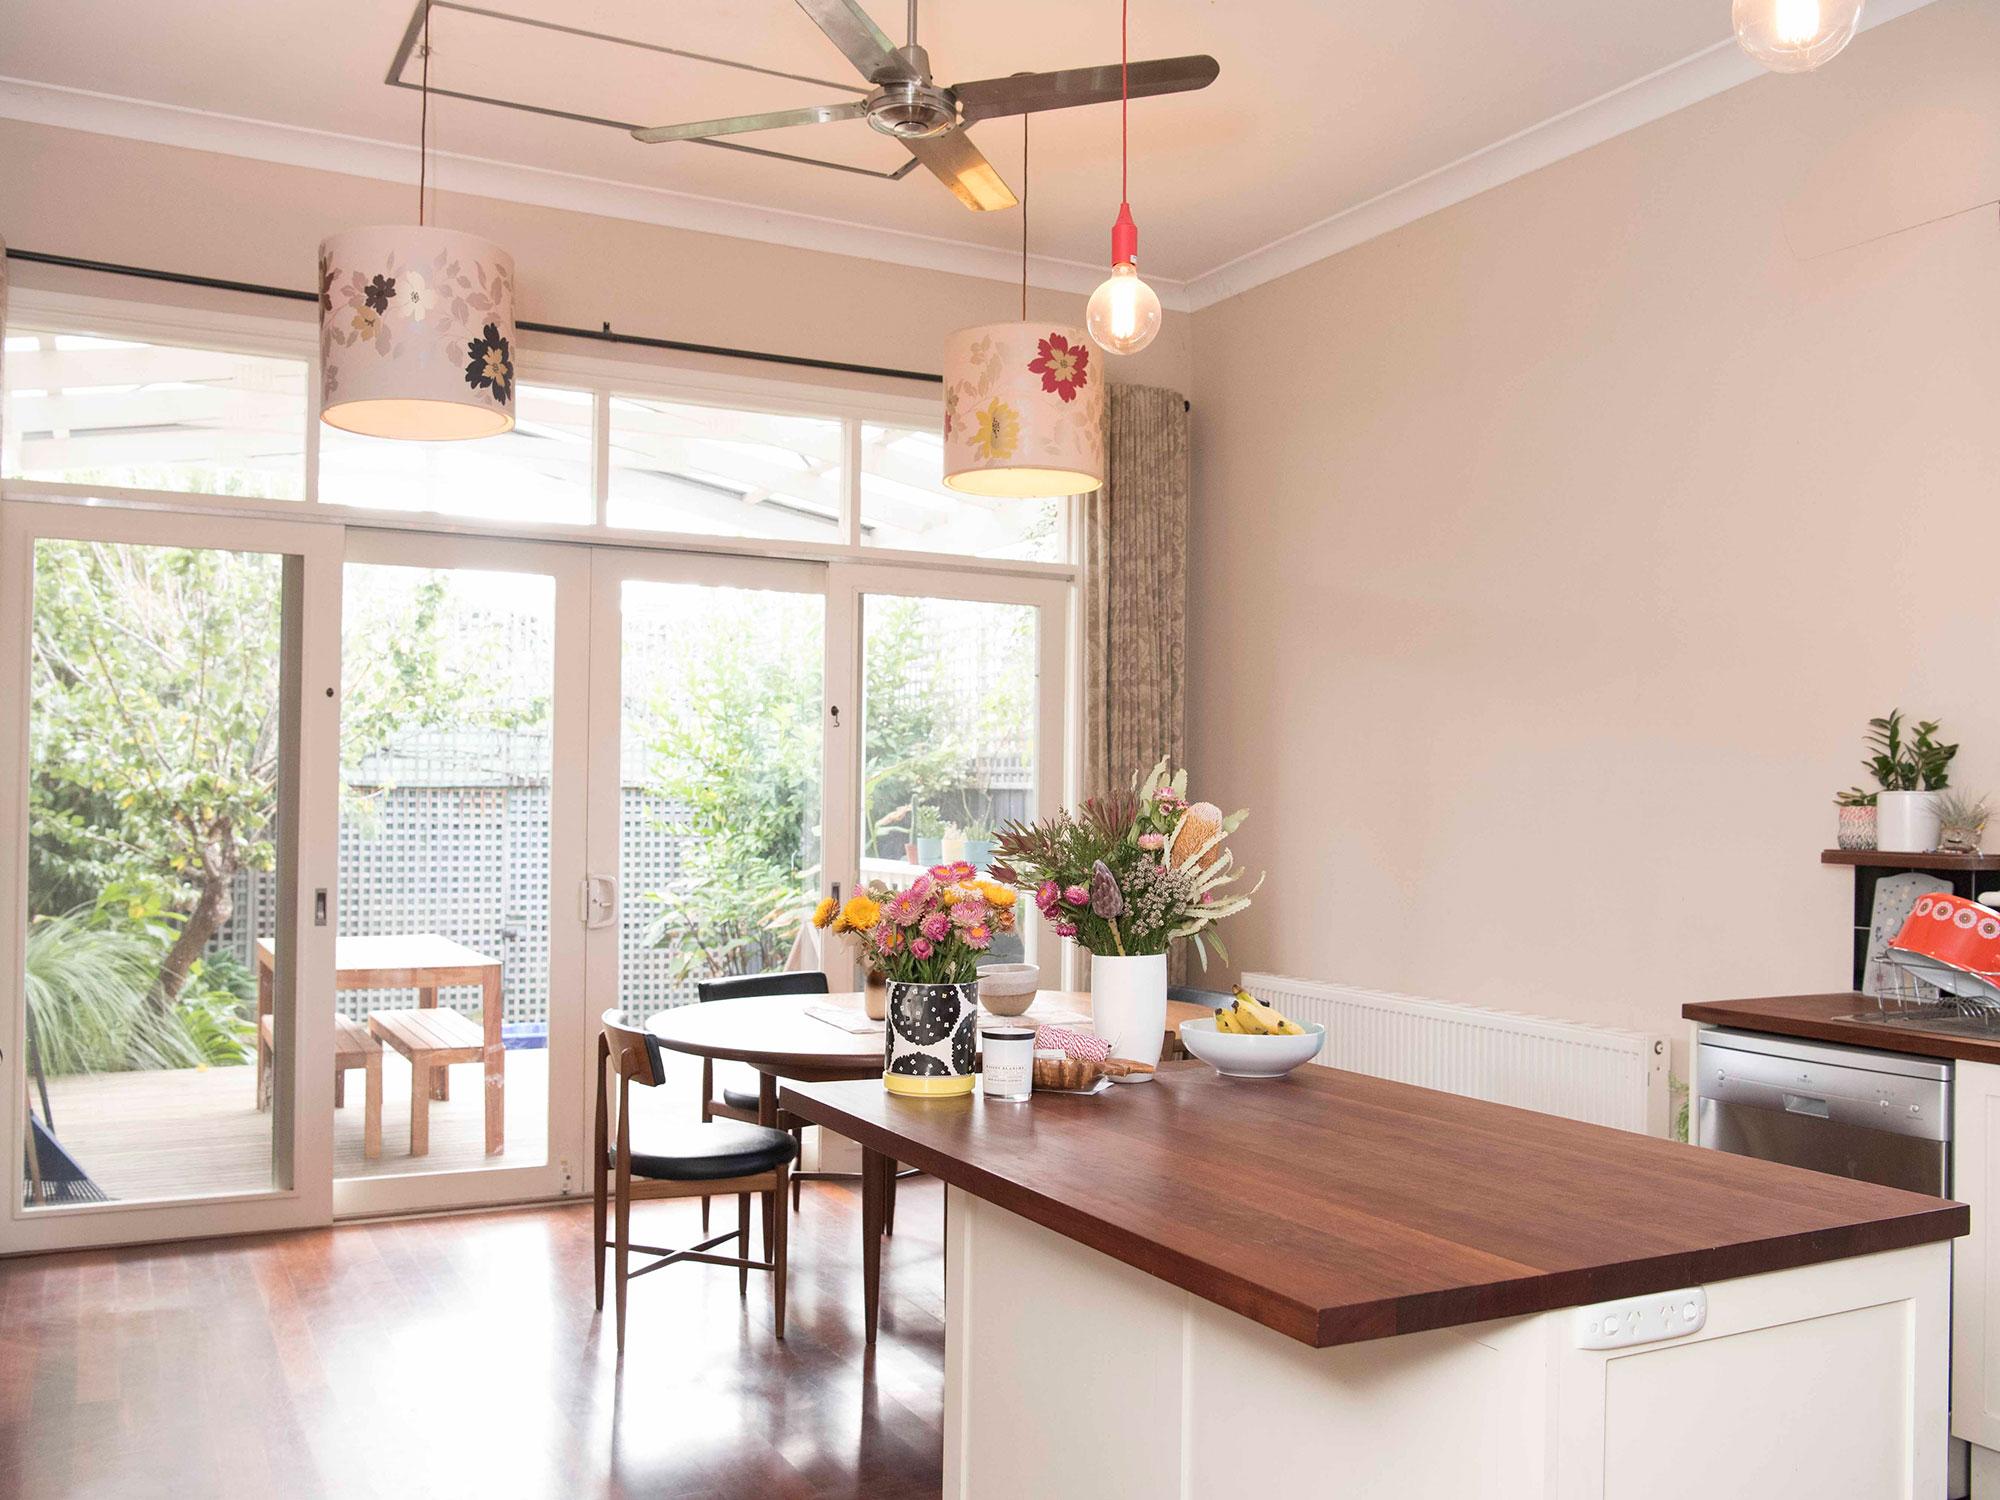 Kitchen Design Ideas And Photos Gallery